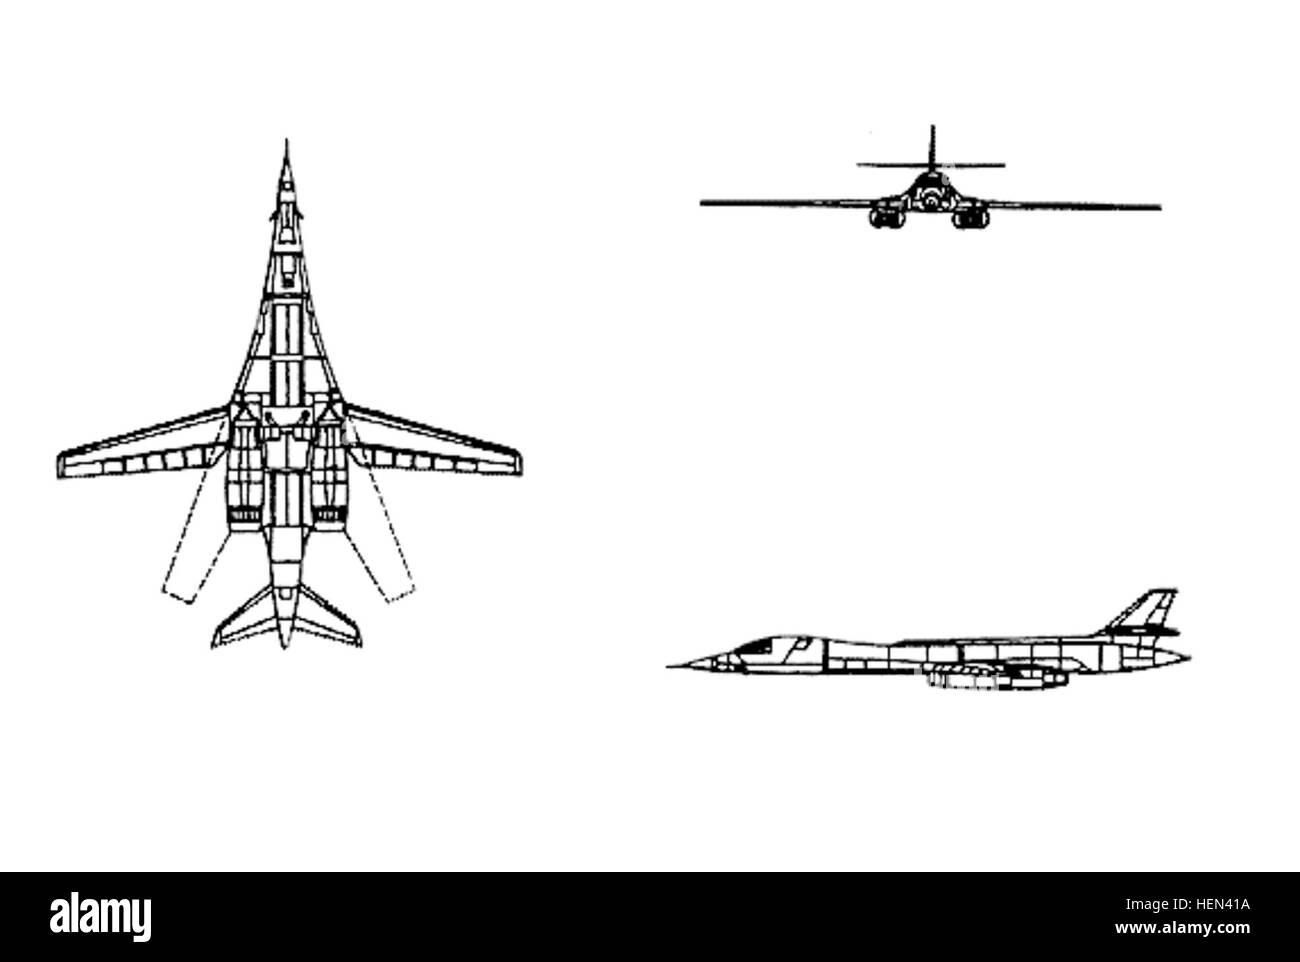 B-1B drawing Stock Photo: 129541926 - Alamy